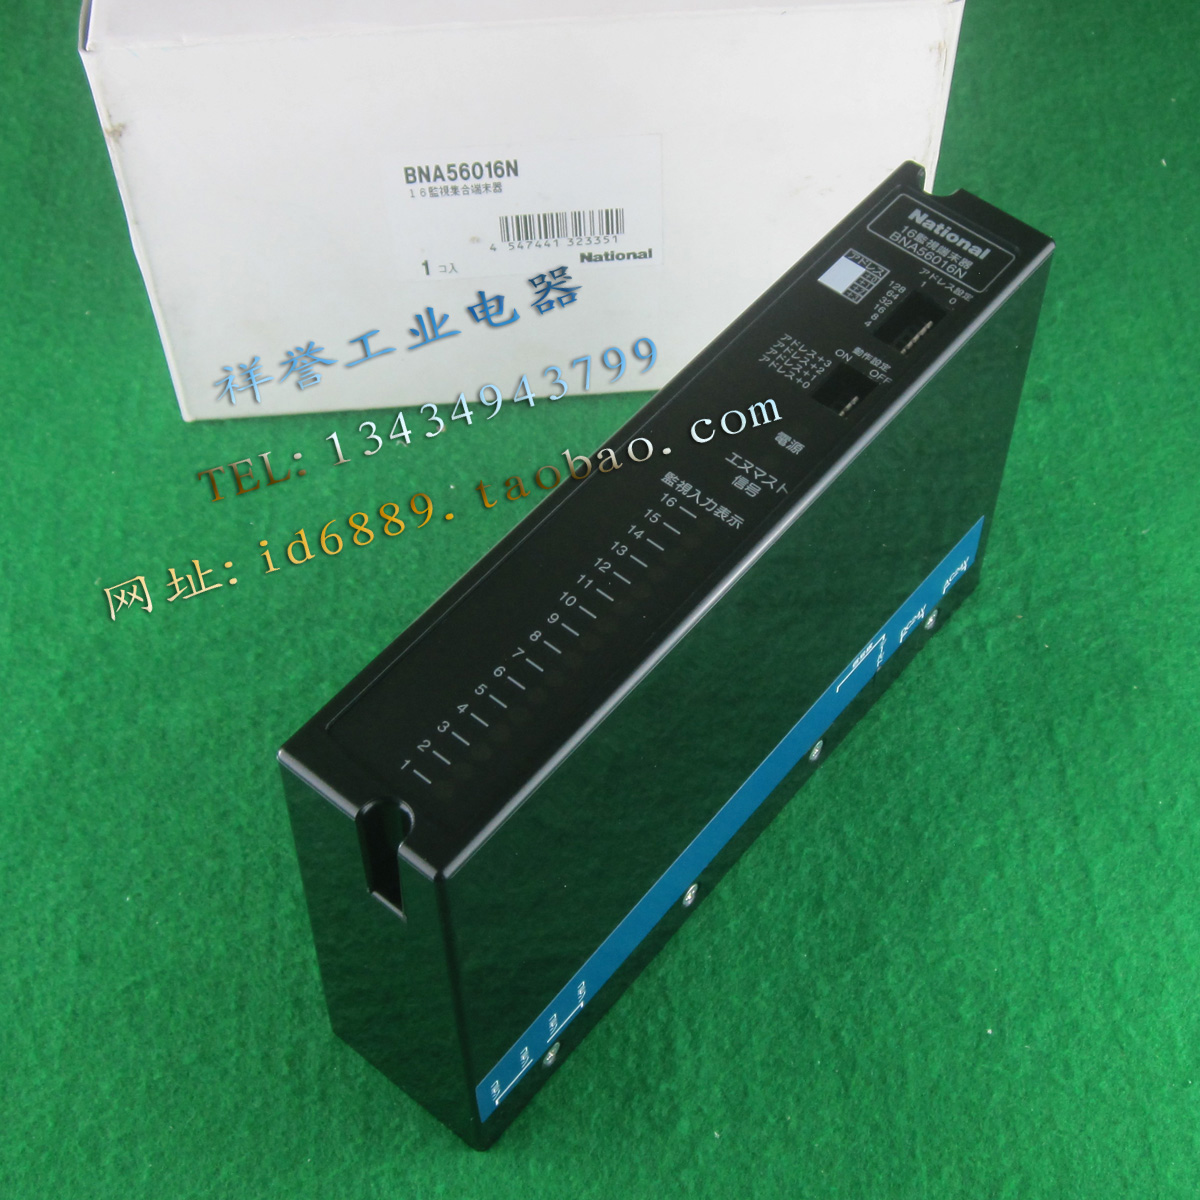 Genuine Panasonic national bna56016n 16 monitoring terminal